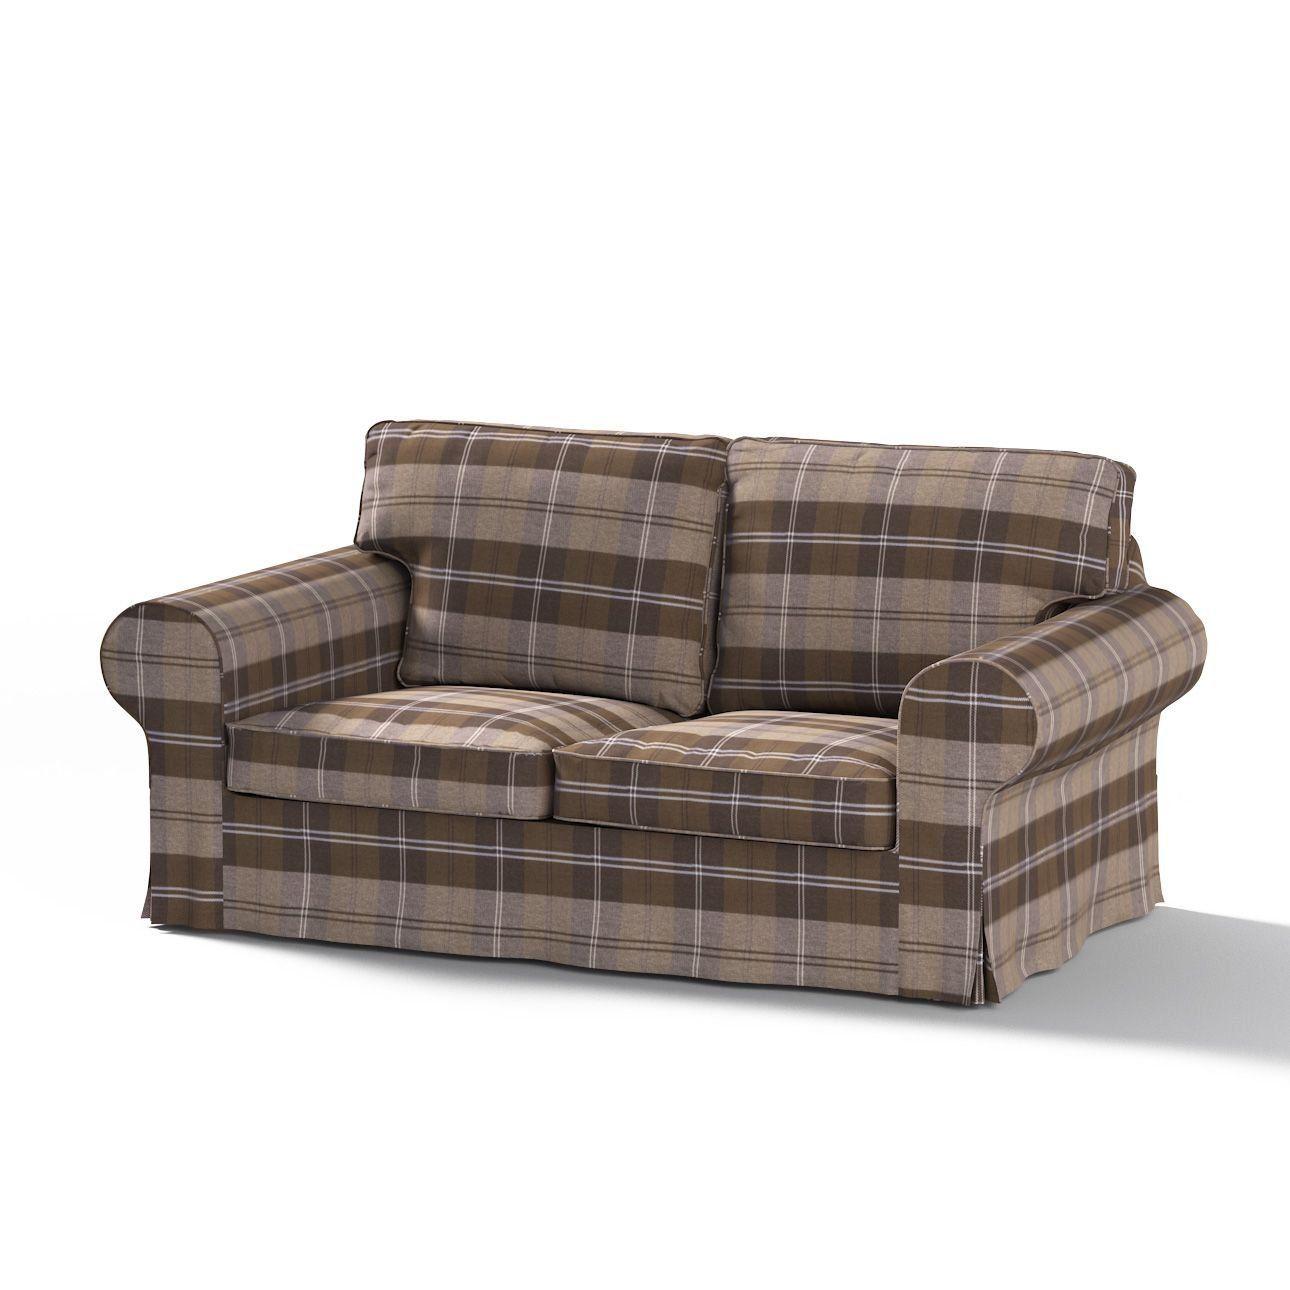 Dekoria Fire Retarding Ikea Ektorp 2-seater sofa bed cover (for model on sale in Ikea 2004-2012) - brown & beige tartan